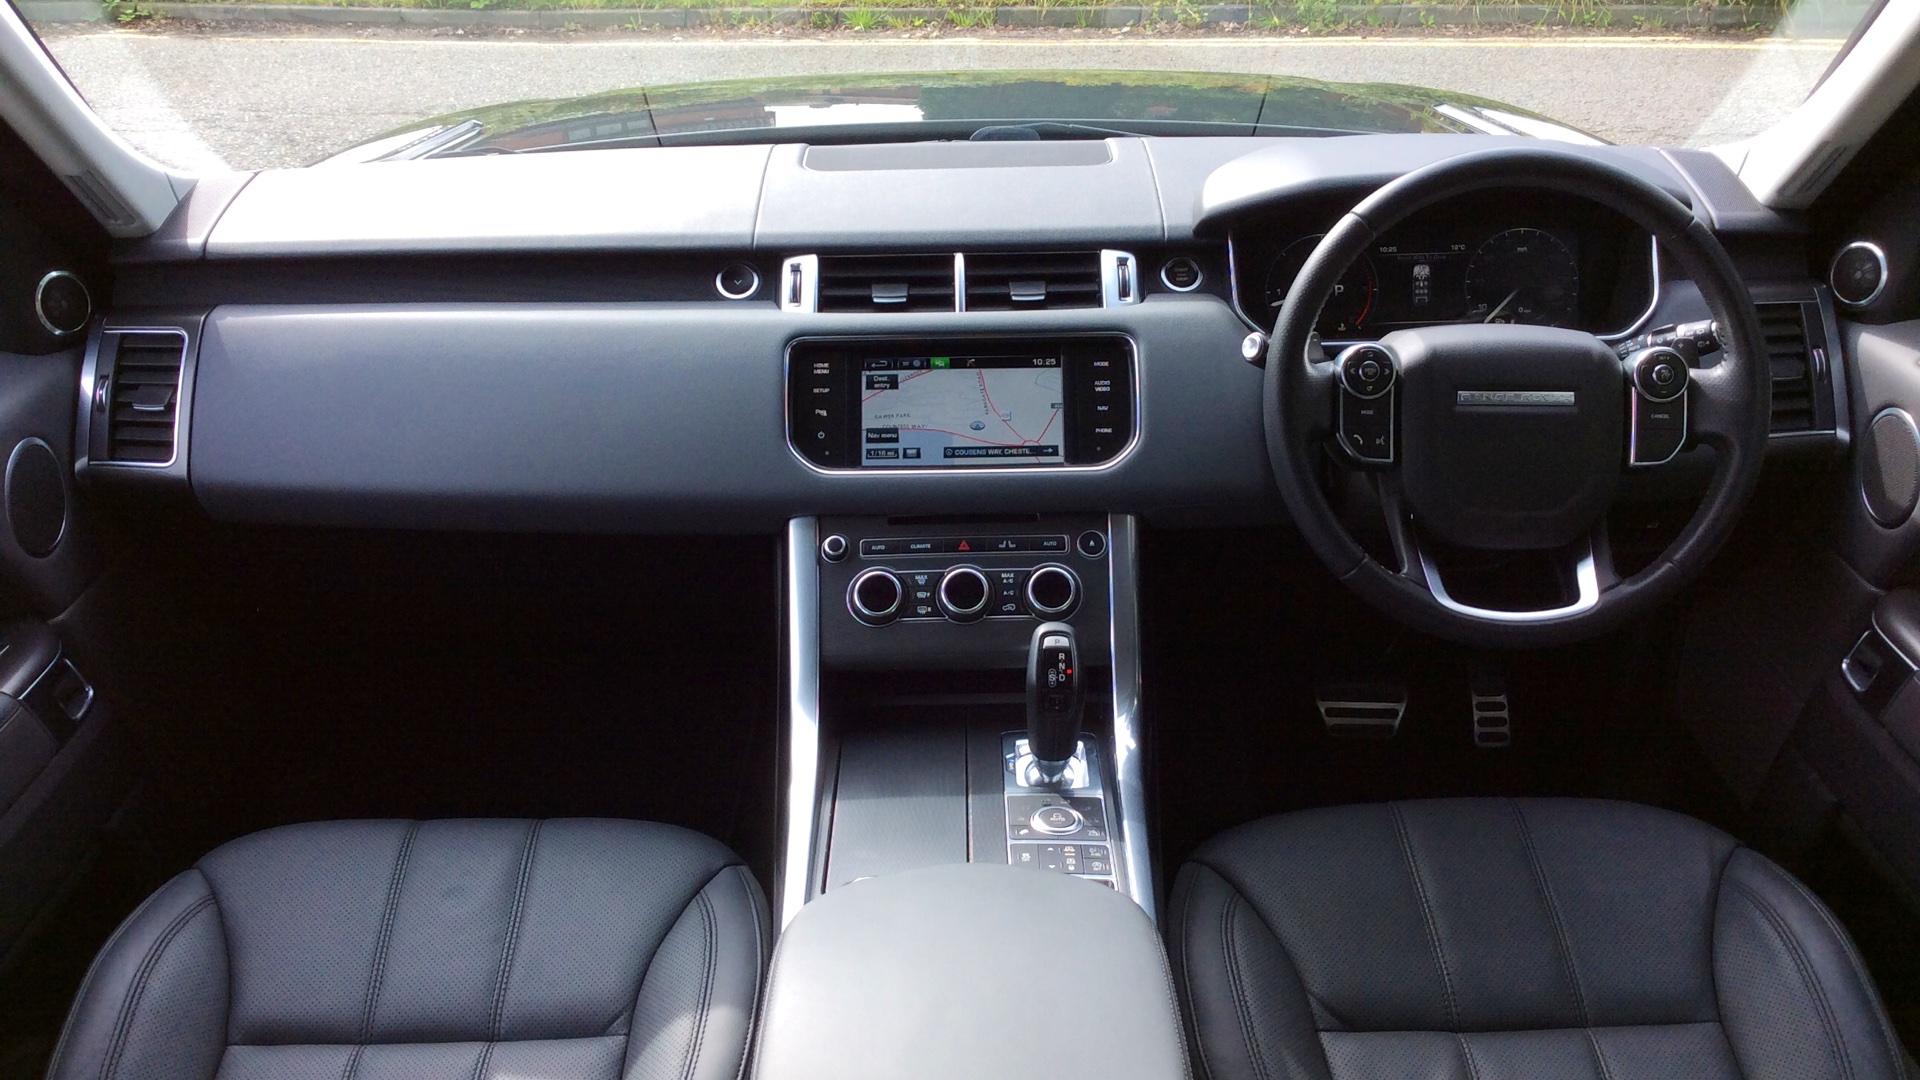 Used Land Rover Range Rover Sport HSE Dynamic SDV6 Black DG14MTZ